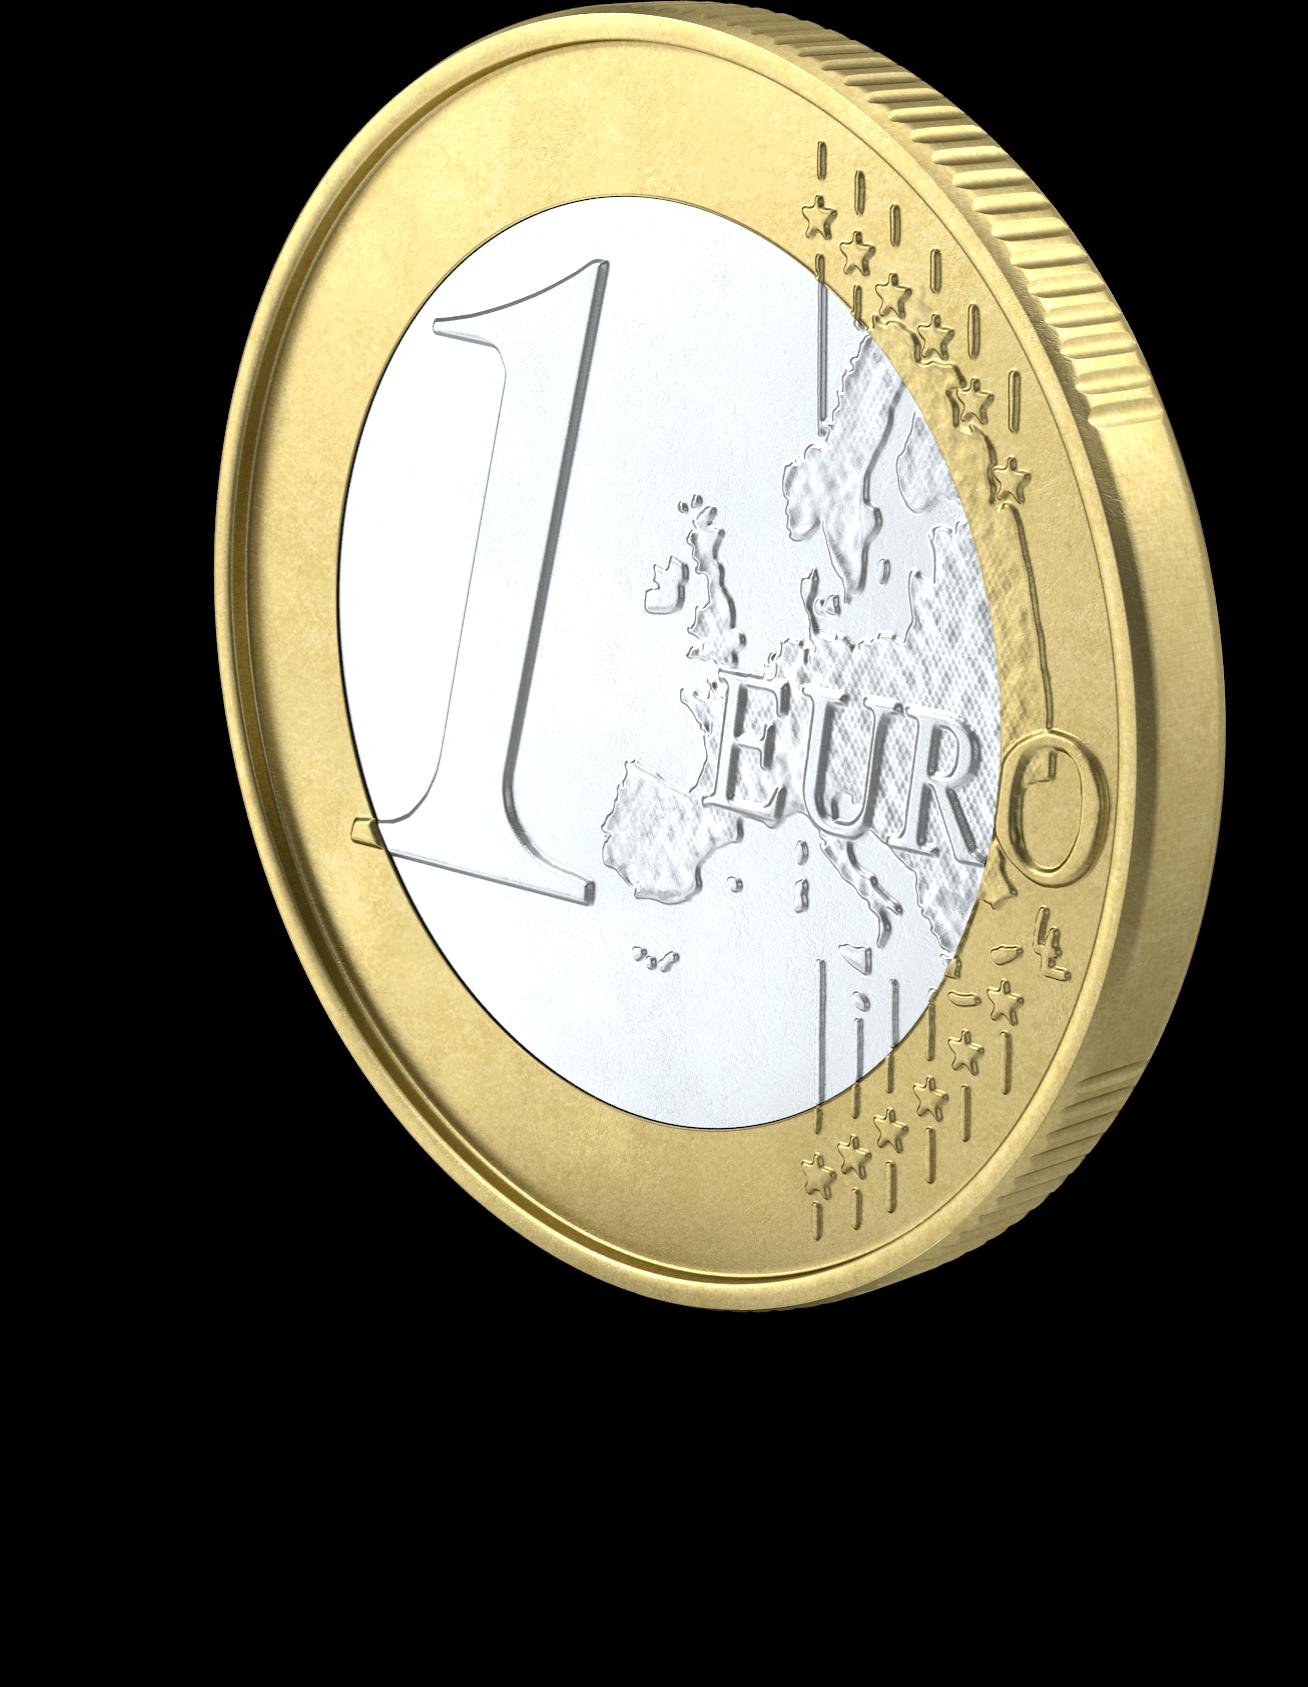 isolation à 1 euro avec da costa